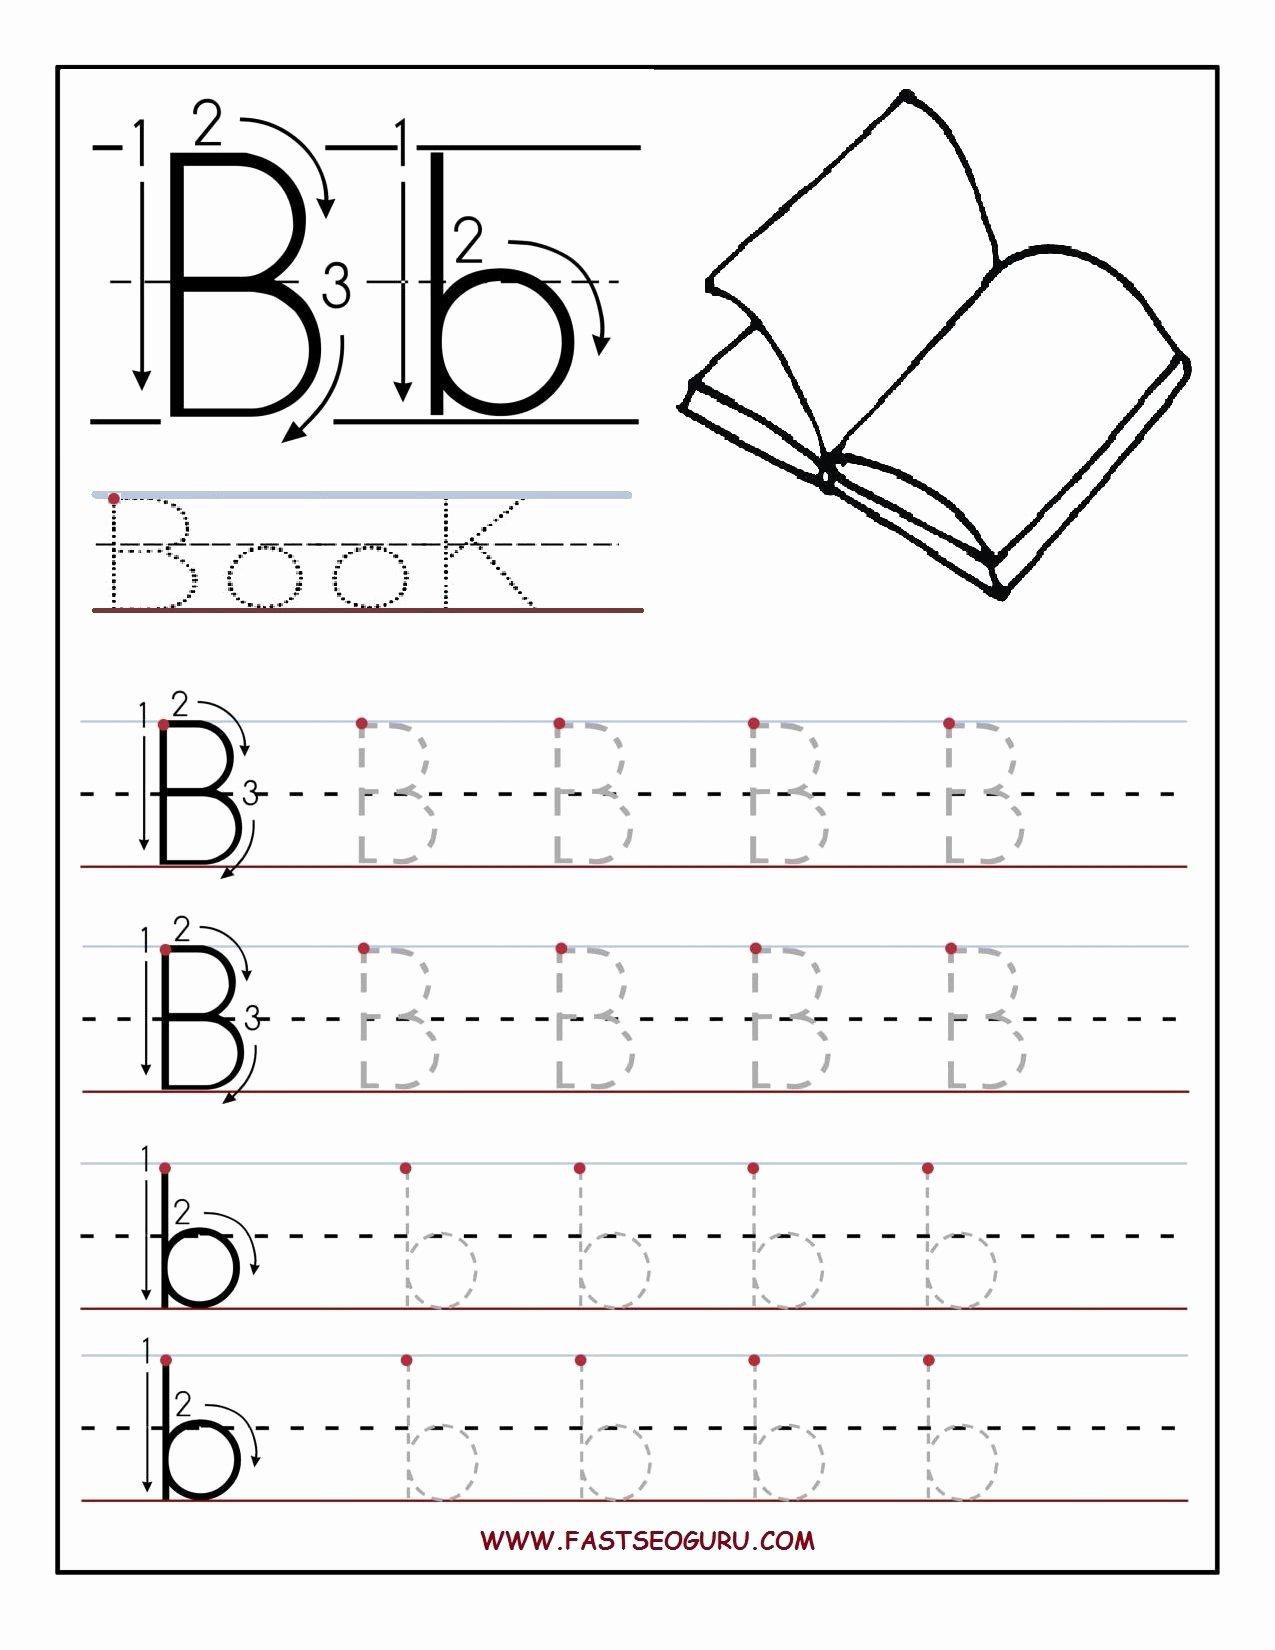 Letter B Worksheets for Preschoolers Free Printable Letter B Tracing Worksheets for Preschool